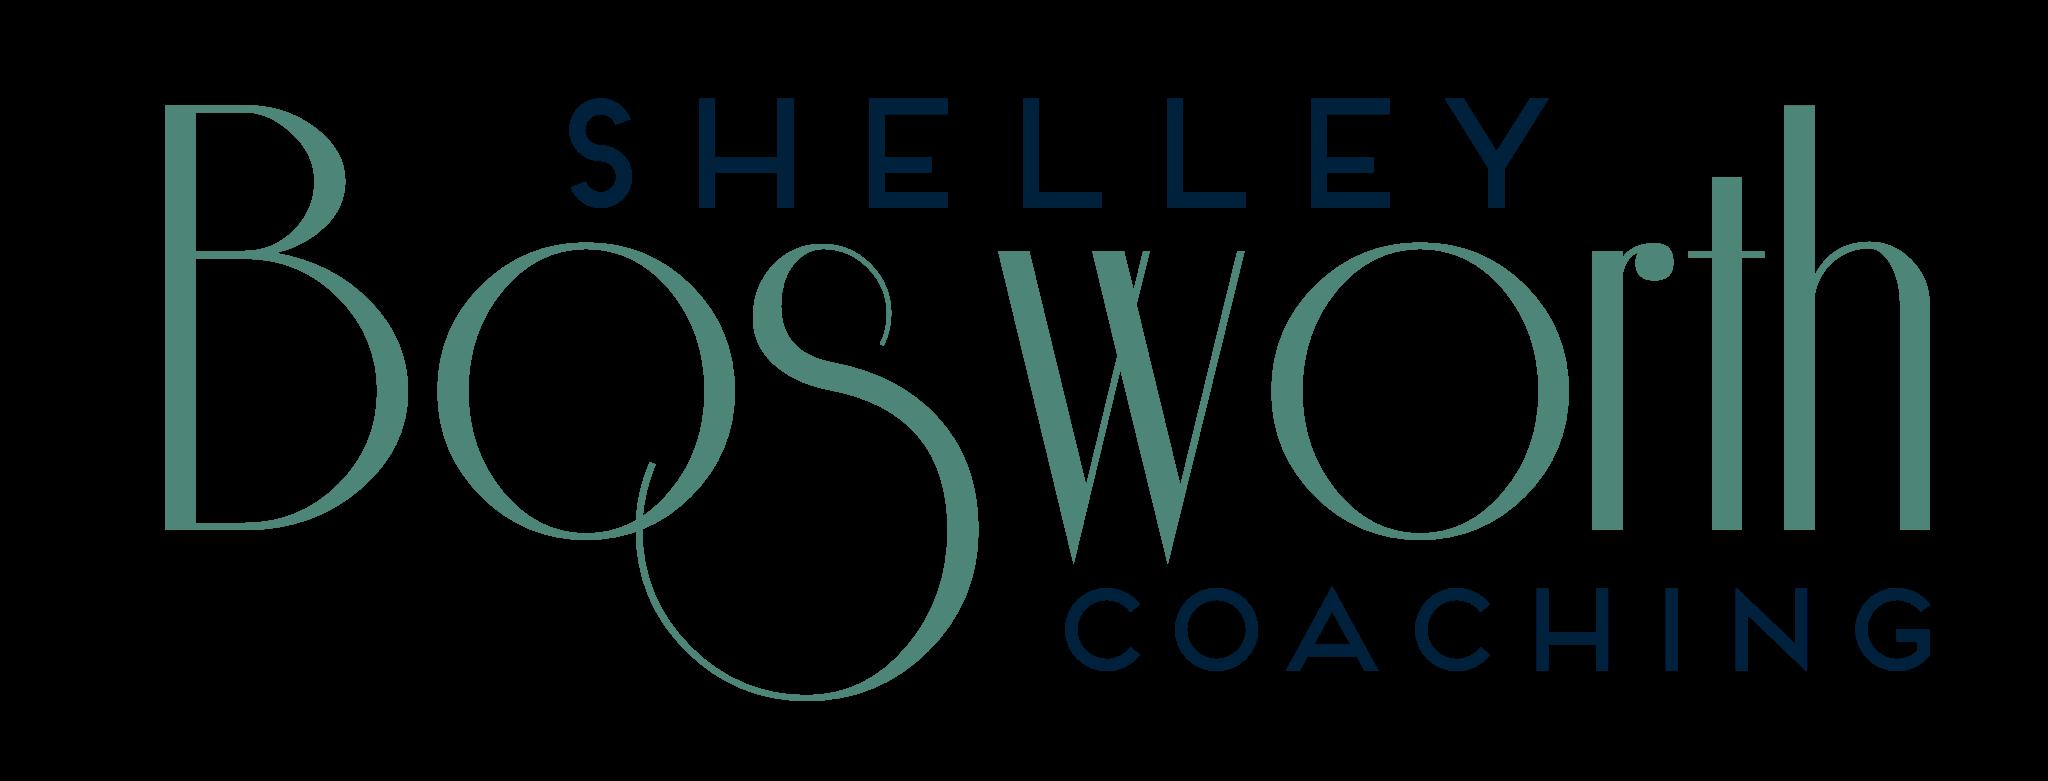 Shelley Bosworth Coaching Logo